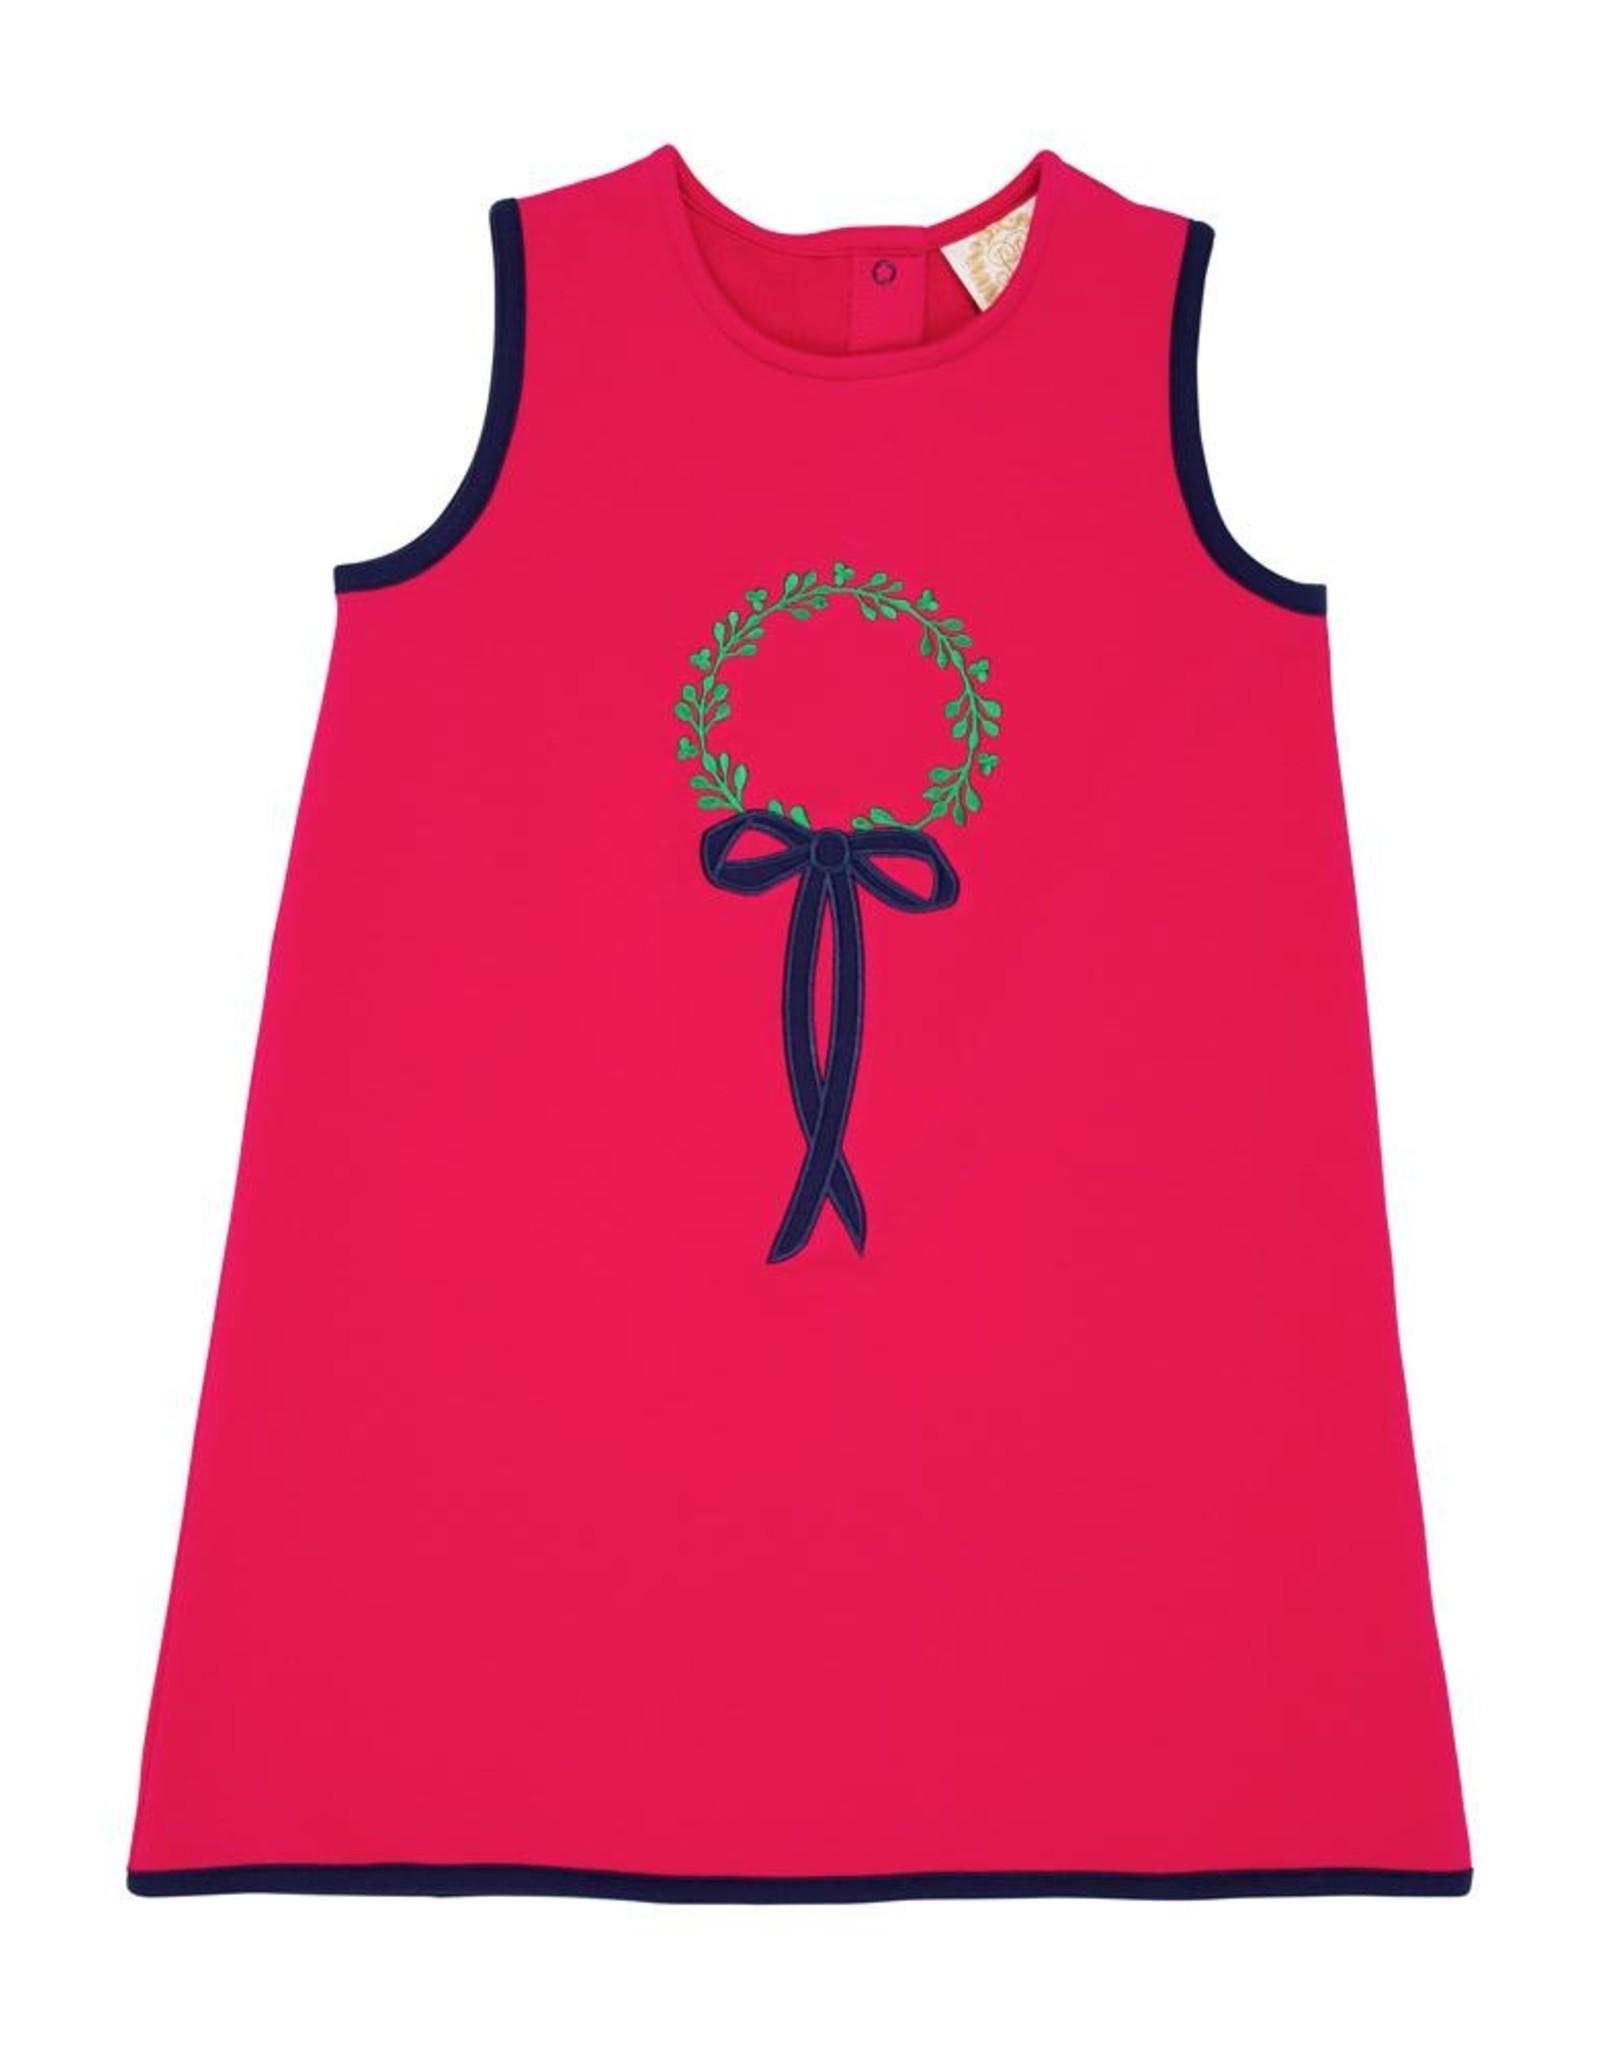 The Beaufort Bonnet Company Annie Apron Dress in Raleigh Raspberry w/ Wreath